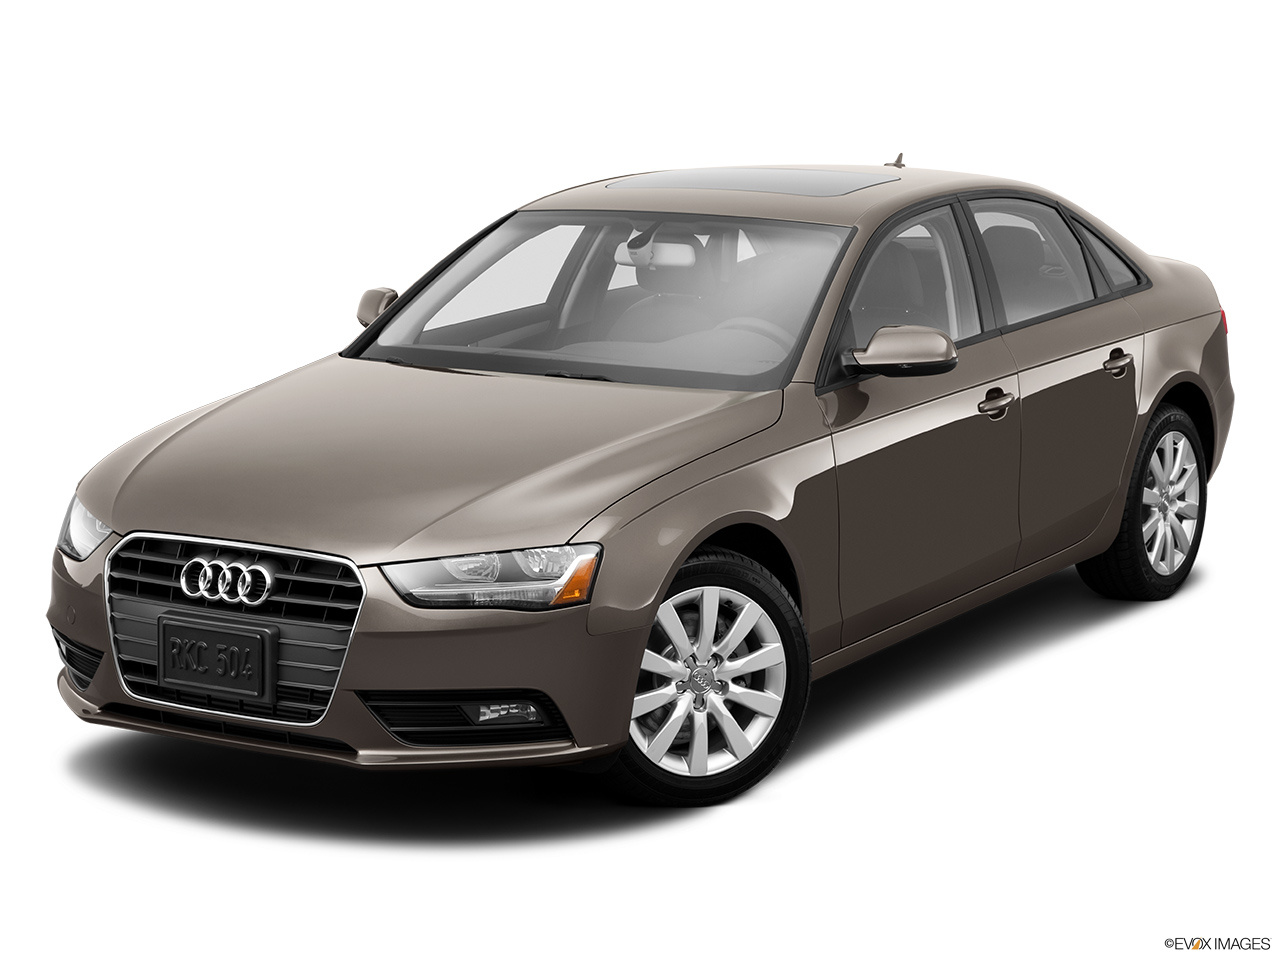 2014 audi a4 sedan cvt fronttrak 2 0t premium plus. Black Bedroom Furniture Sets. Home Design Ideas